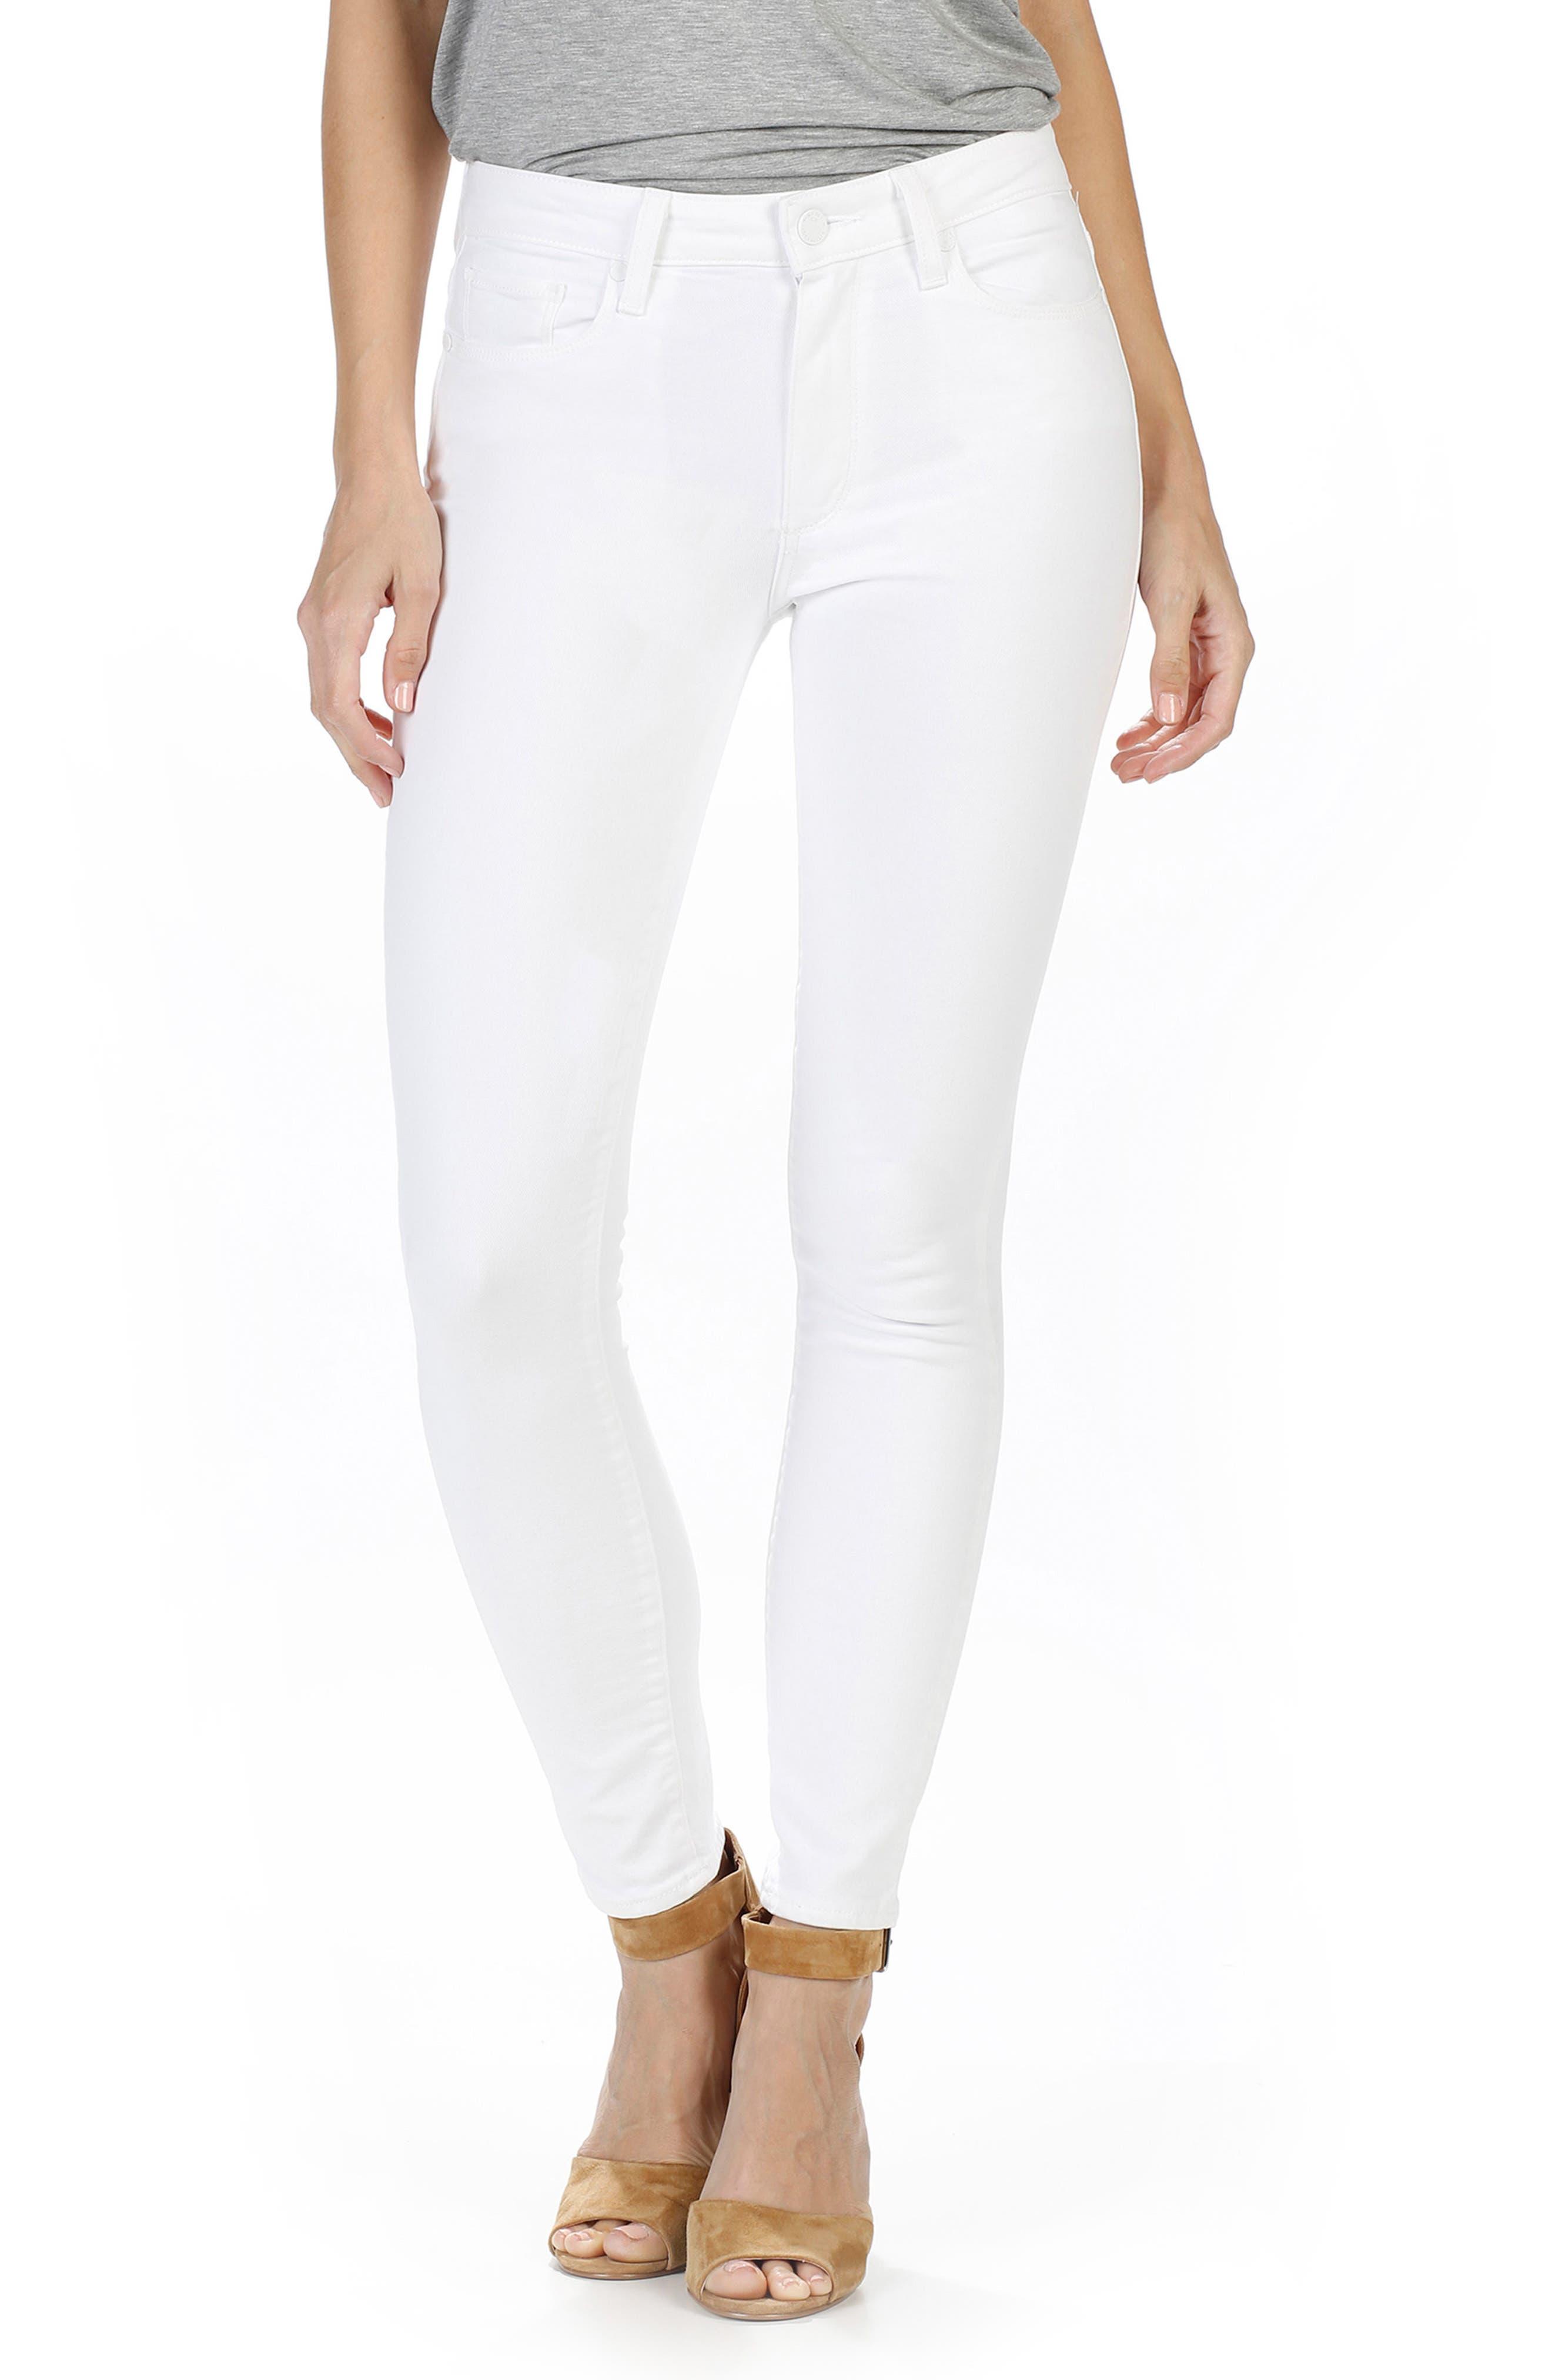 Main Image - PAIGE Hoxton High Waist Ankle Skinny Jeans (Optic White)